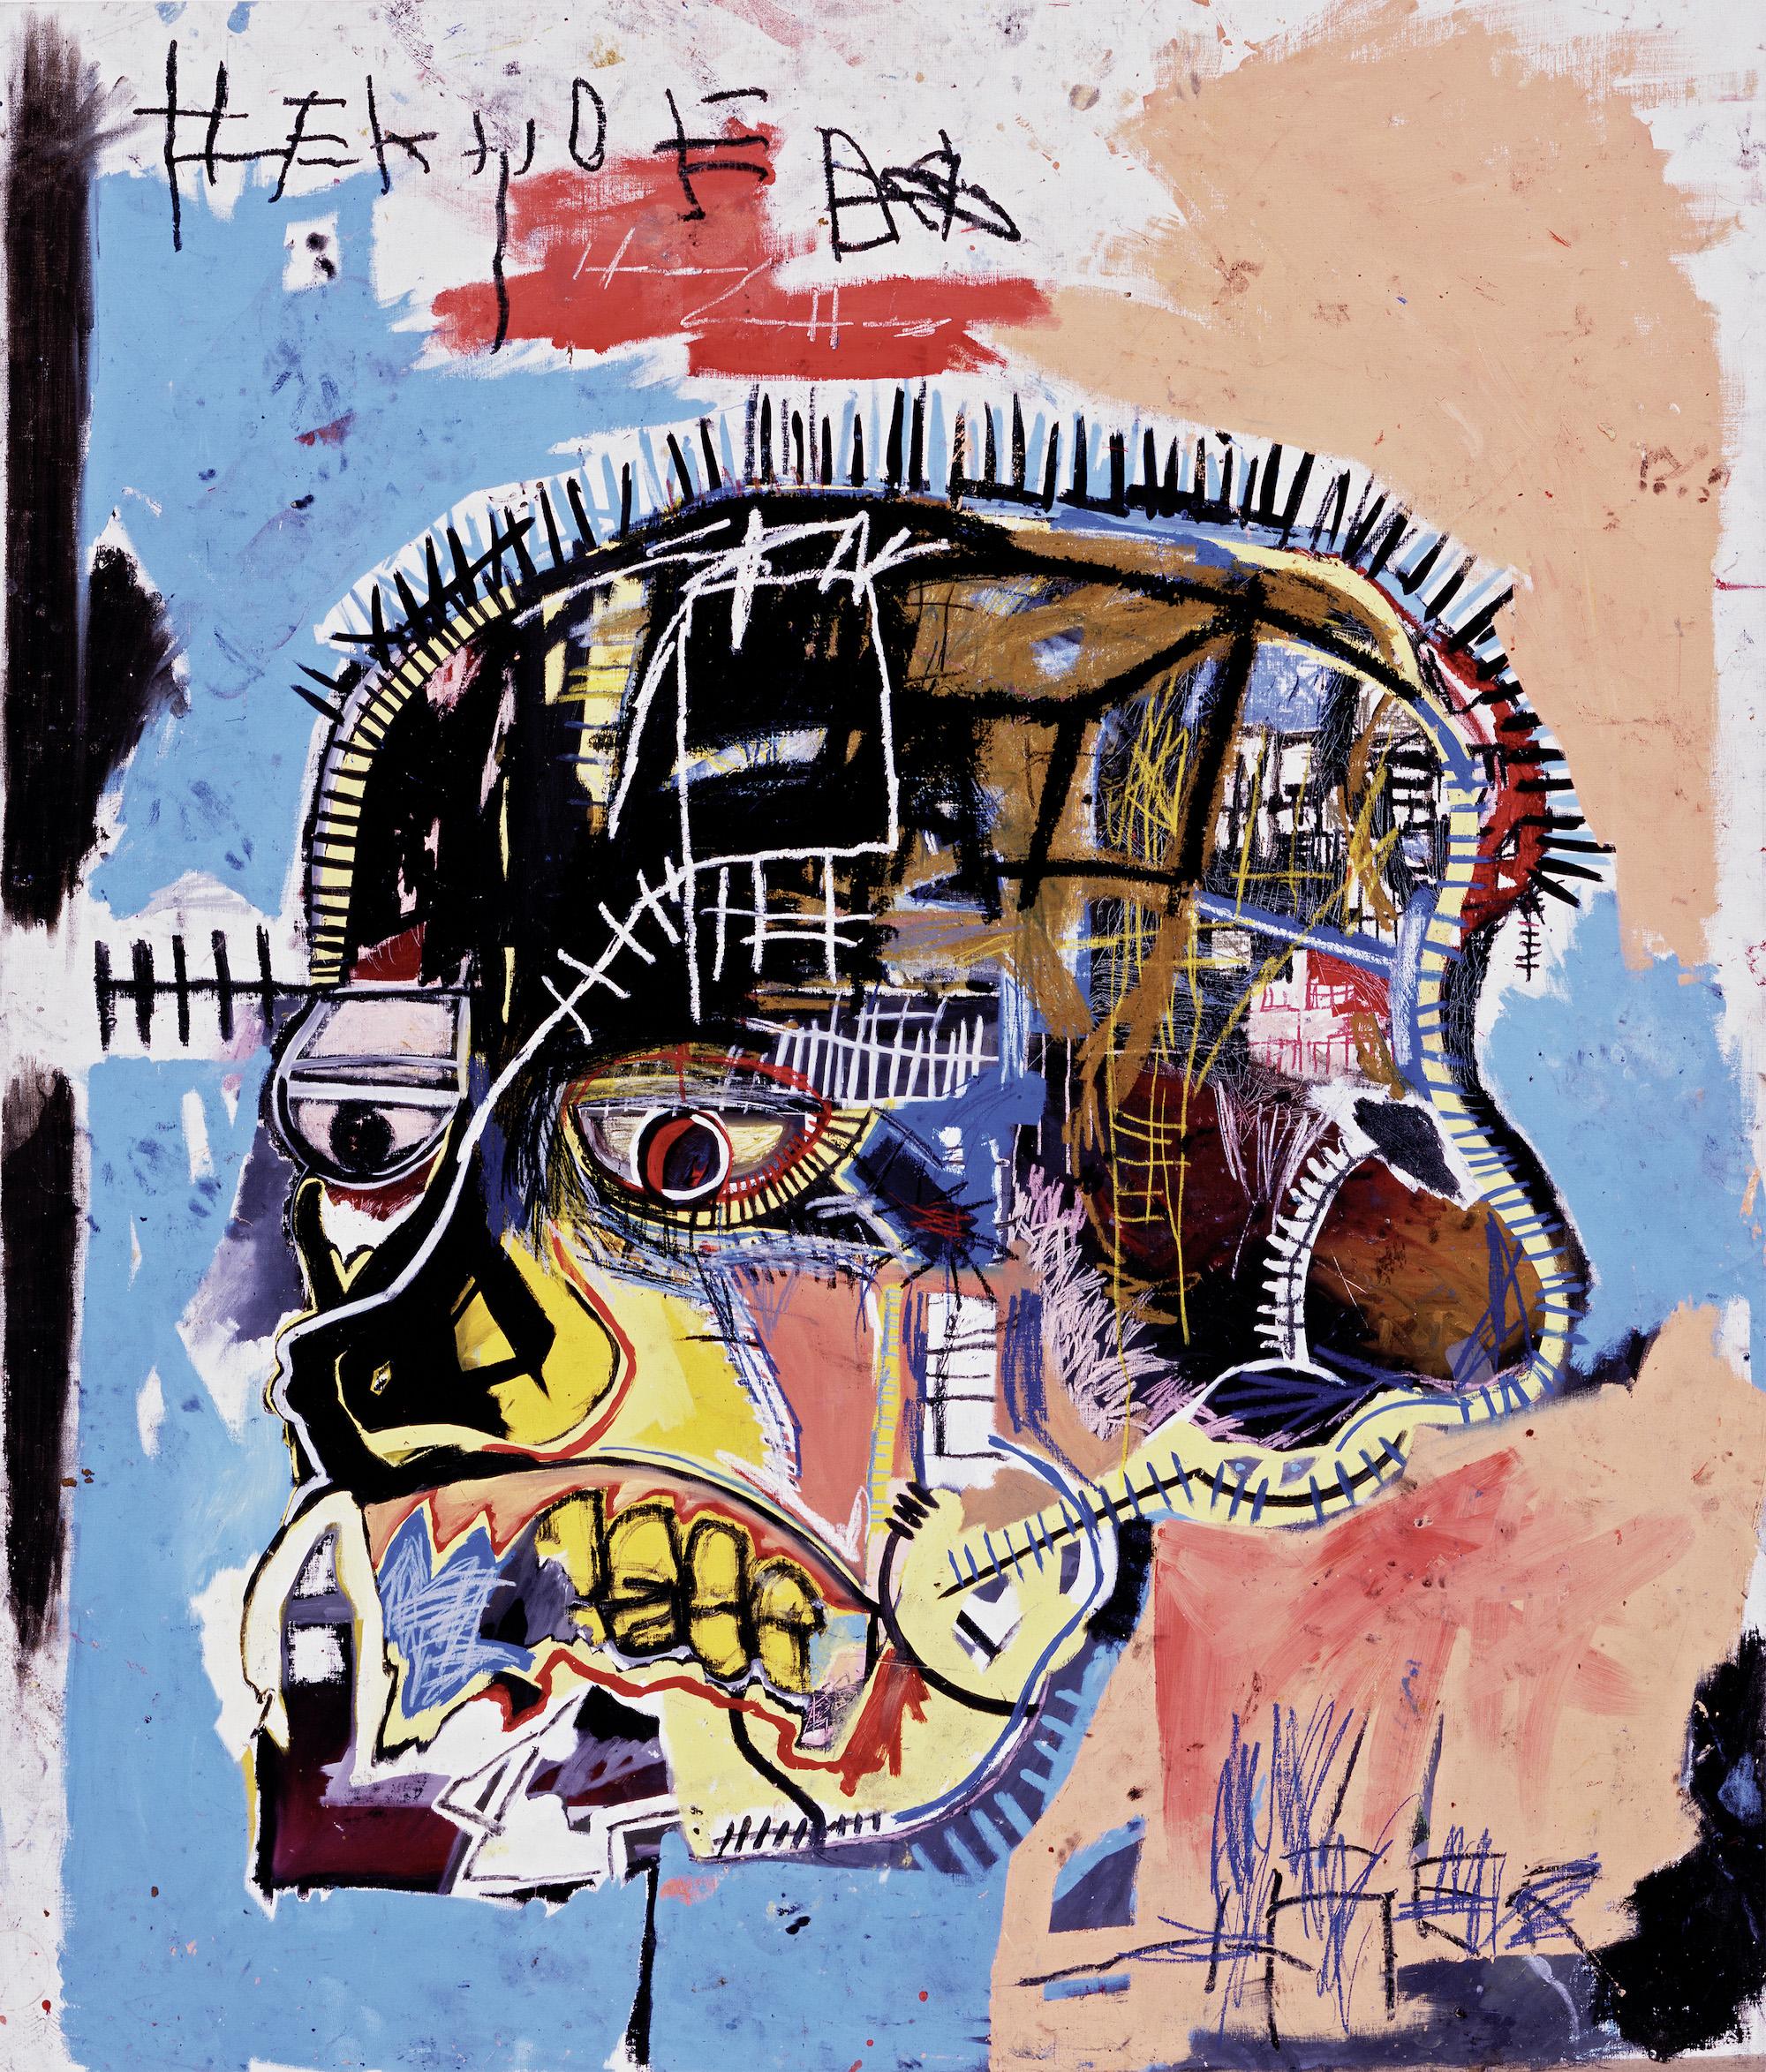 XL_Basquiat_01141_112-113.jpg